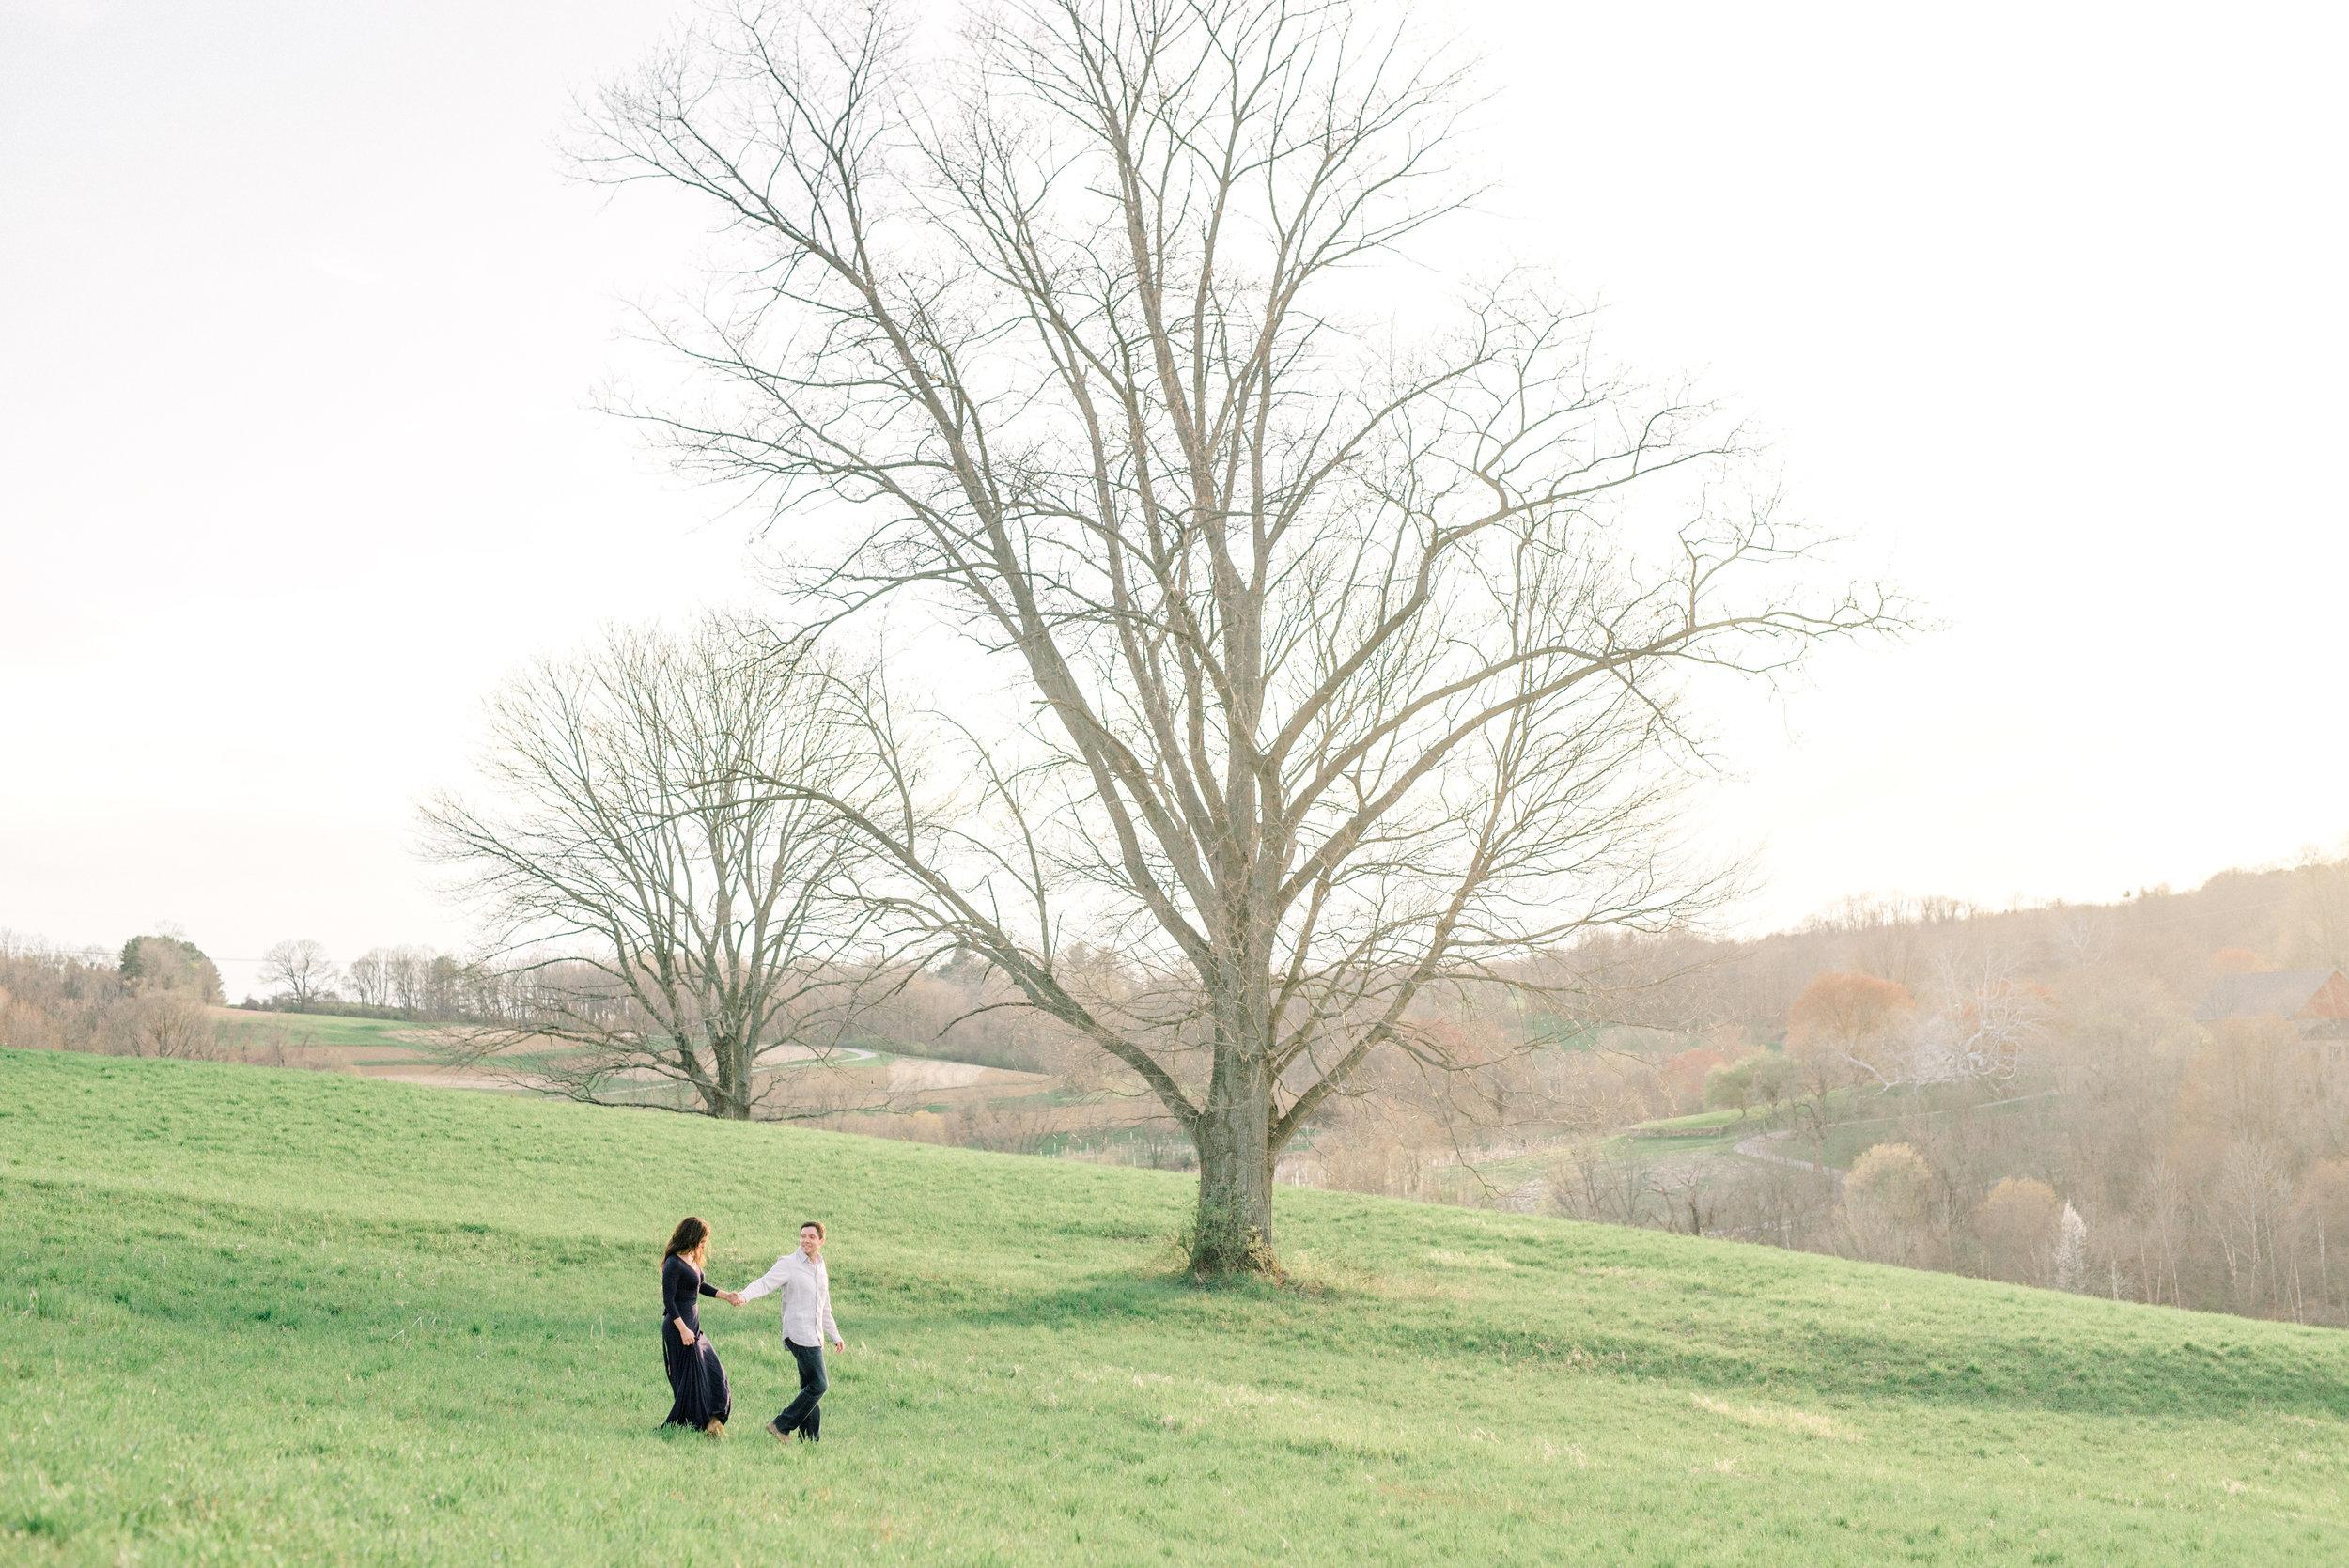 haley-richter-photo-west-chester-enagegment-session-strouds-preserve-039.jpg